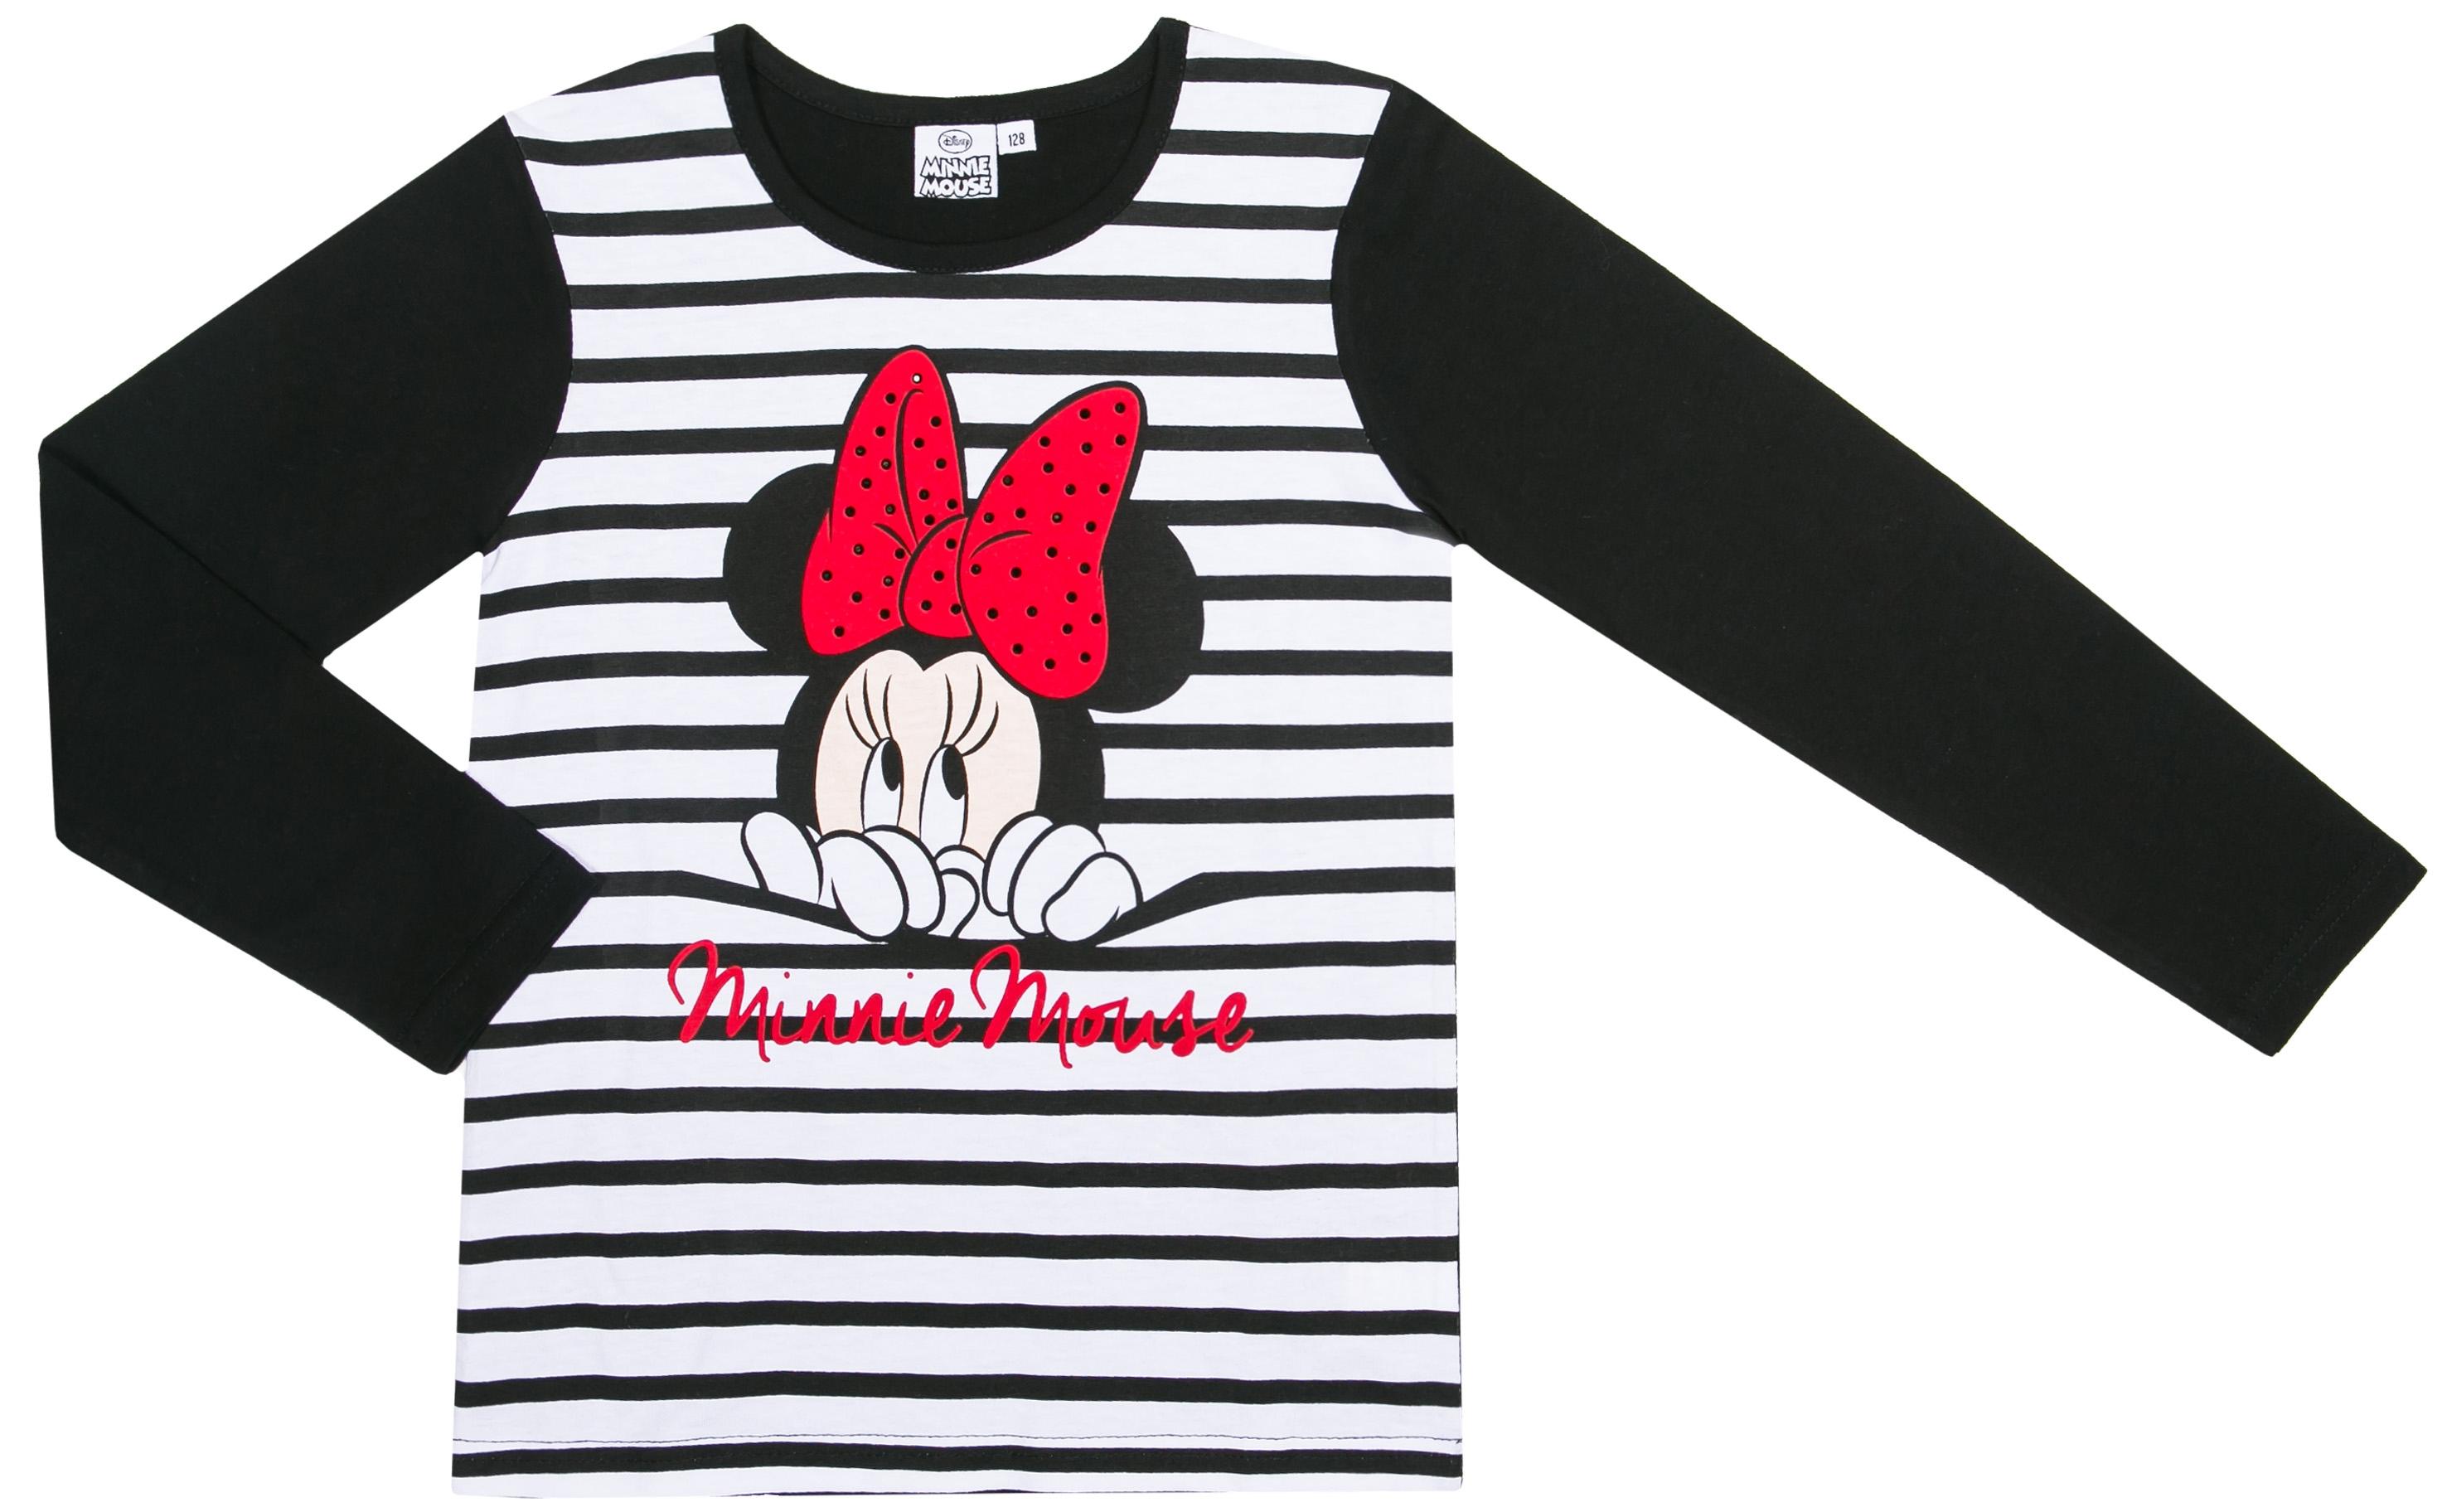 Футболка с длинным рукавом для девочки Disney minnie Minnie Mouse черная keeeper okt матрас для пеленания disney minnie mouse розовый